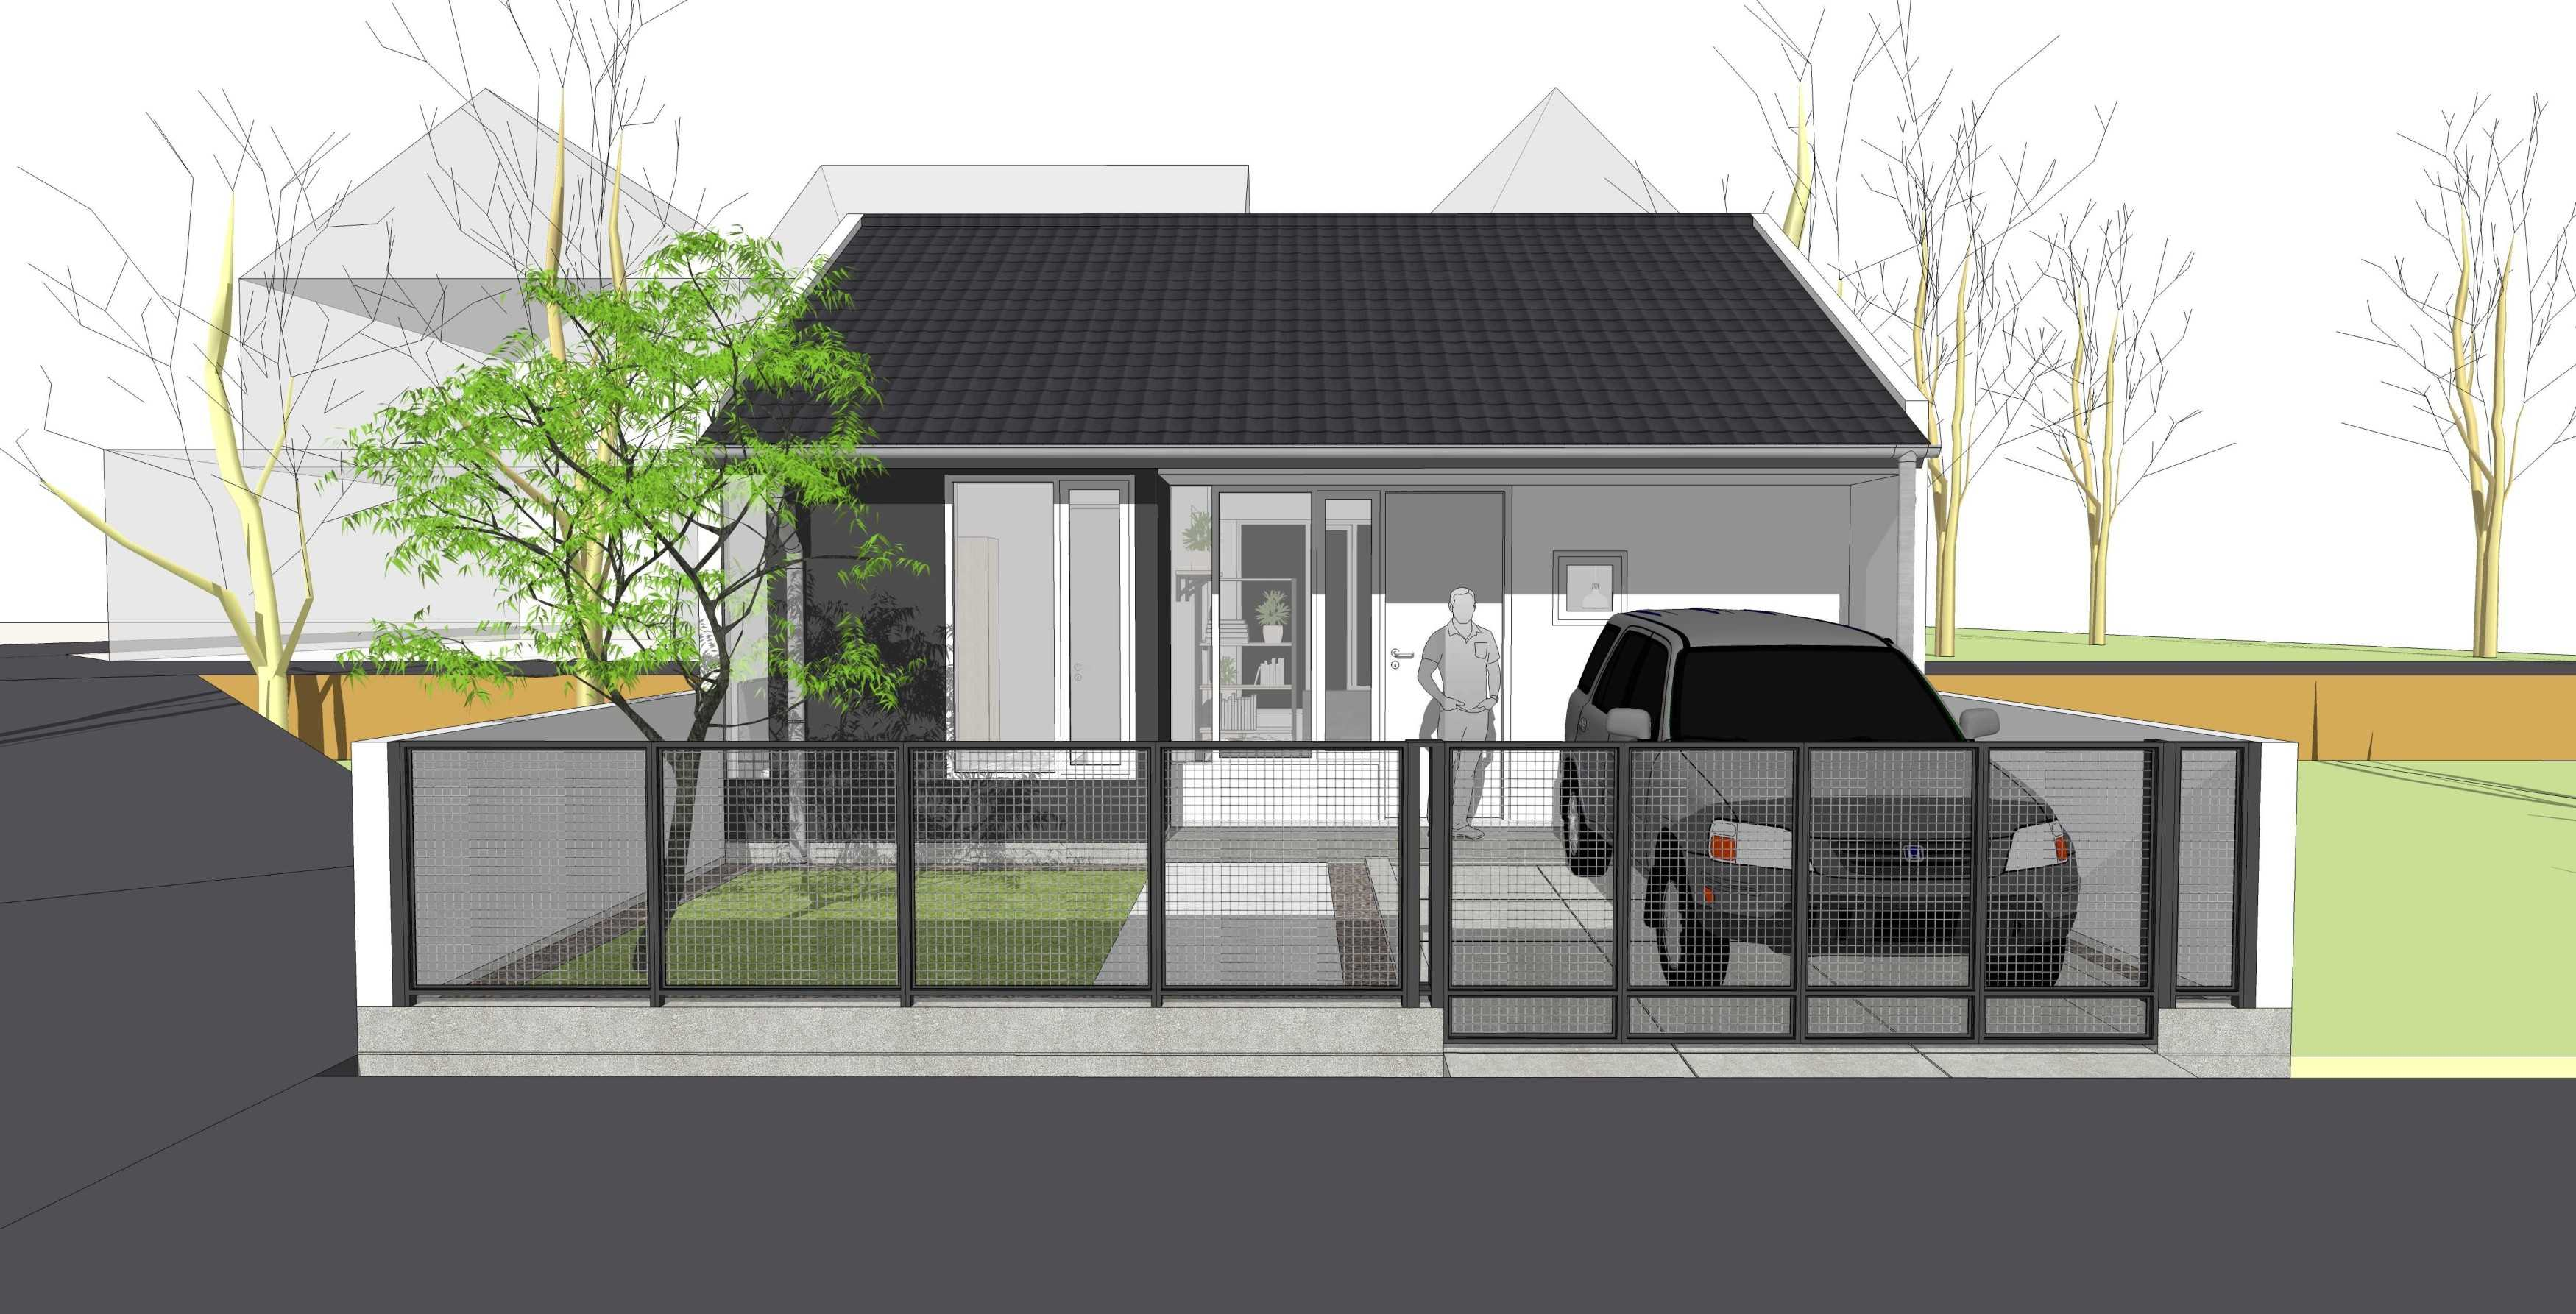 Mid Works Gmw House Jatihandap, Kec. Mandalajati, Kota Bandung, Jawa Barat, Indonesia Jatihandap, Kec. Mandalajati, Kota Bandung, Jawa Barat, Indonesia Mid-Works-Gmw-House   94666